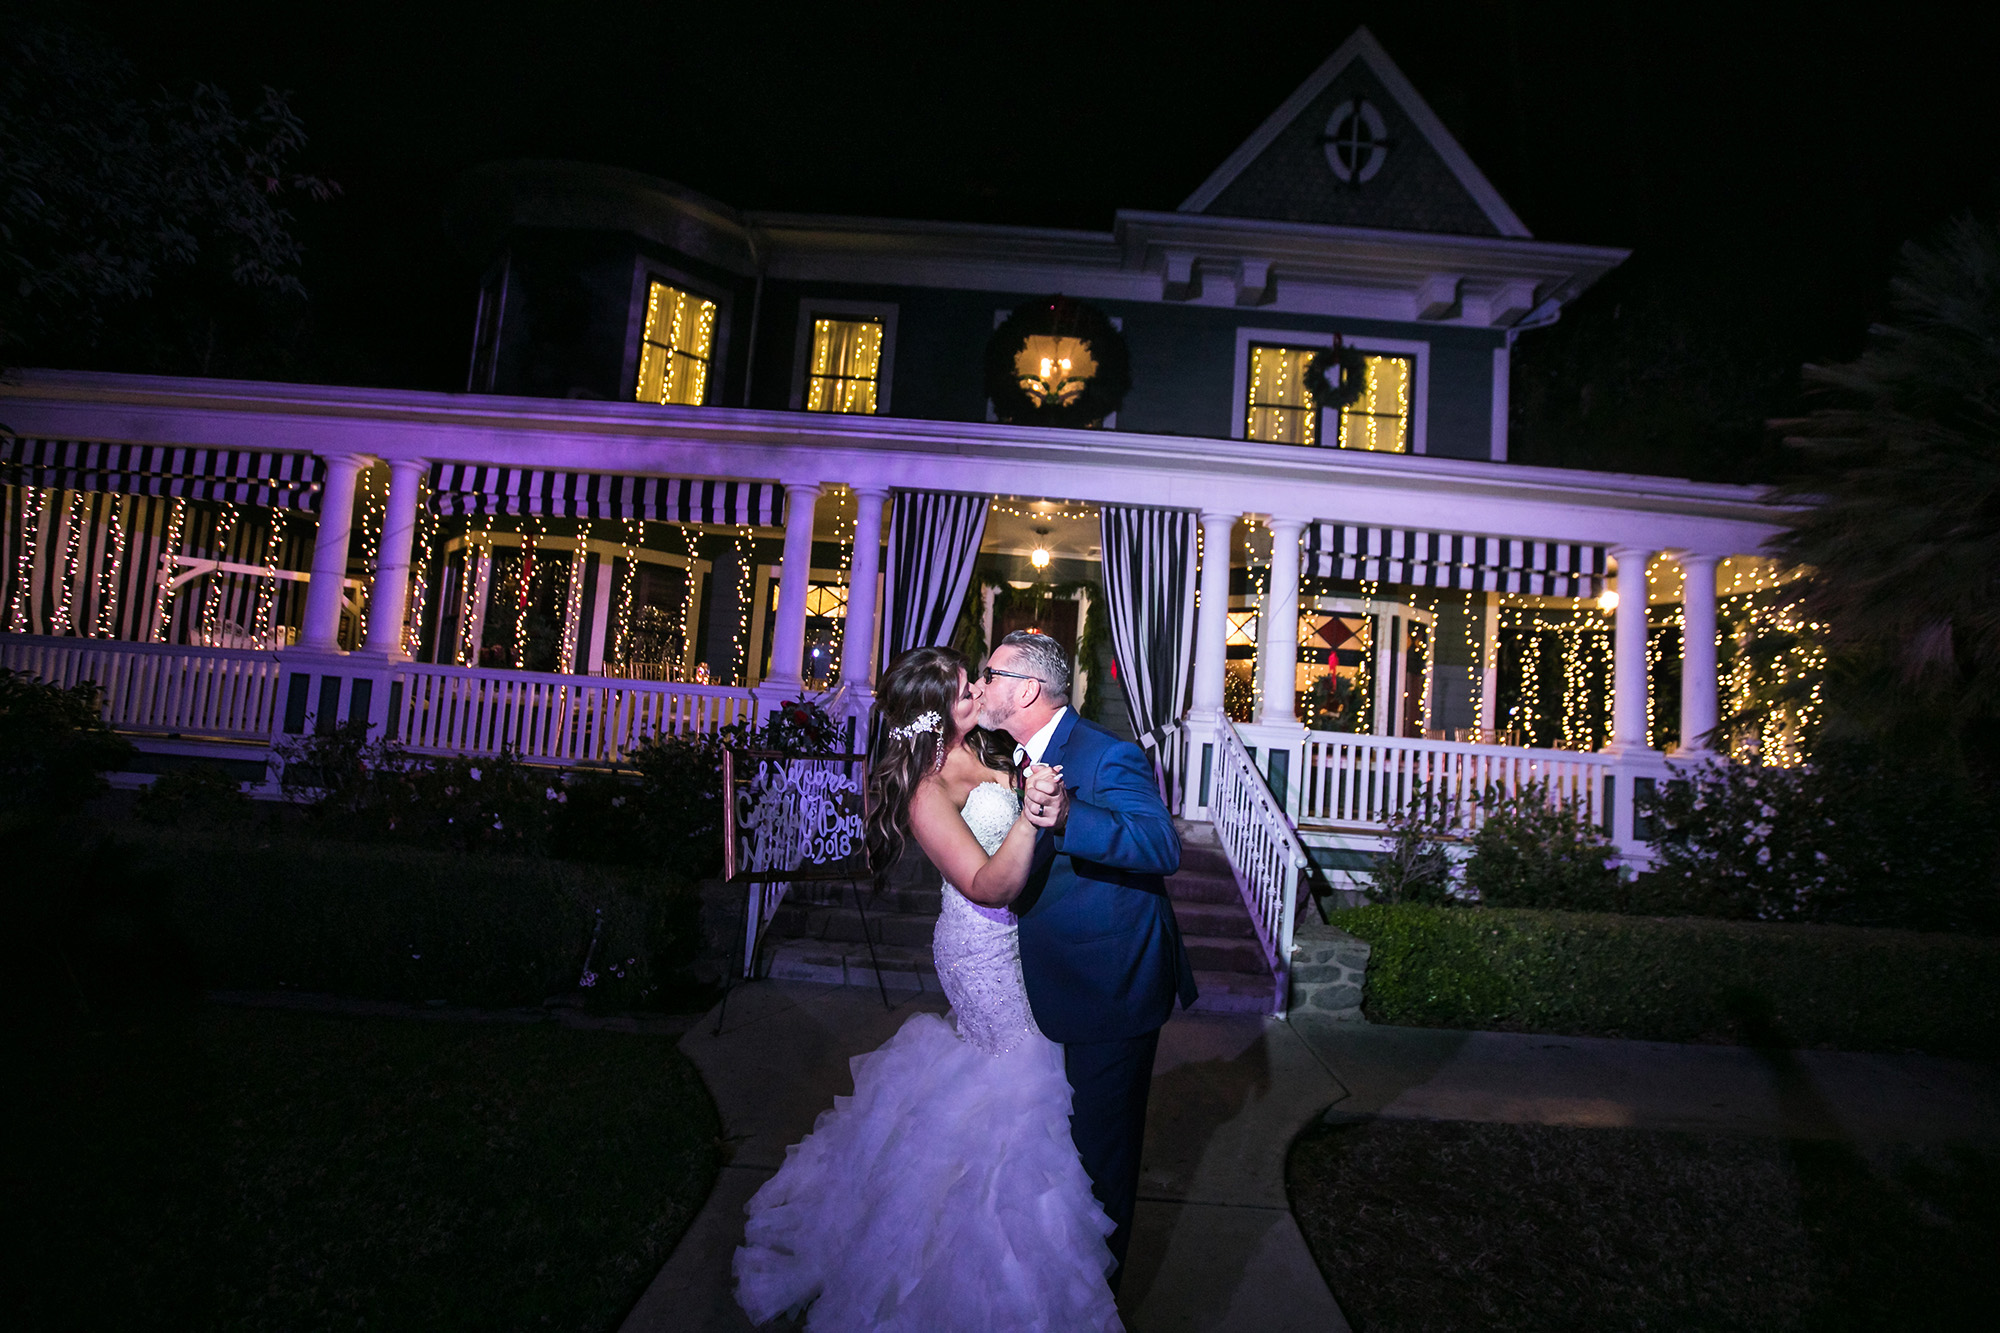 christmas-house-weddings-receptions-carrie-vines-173.jpg